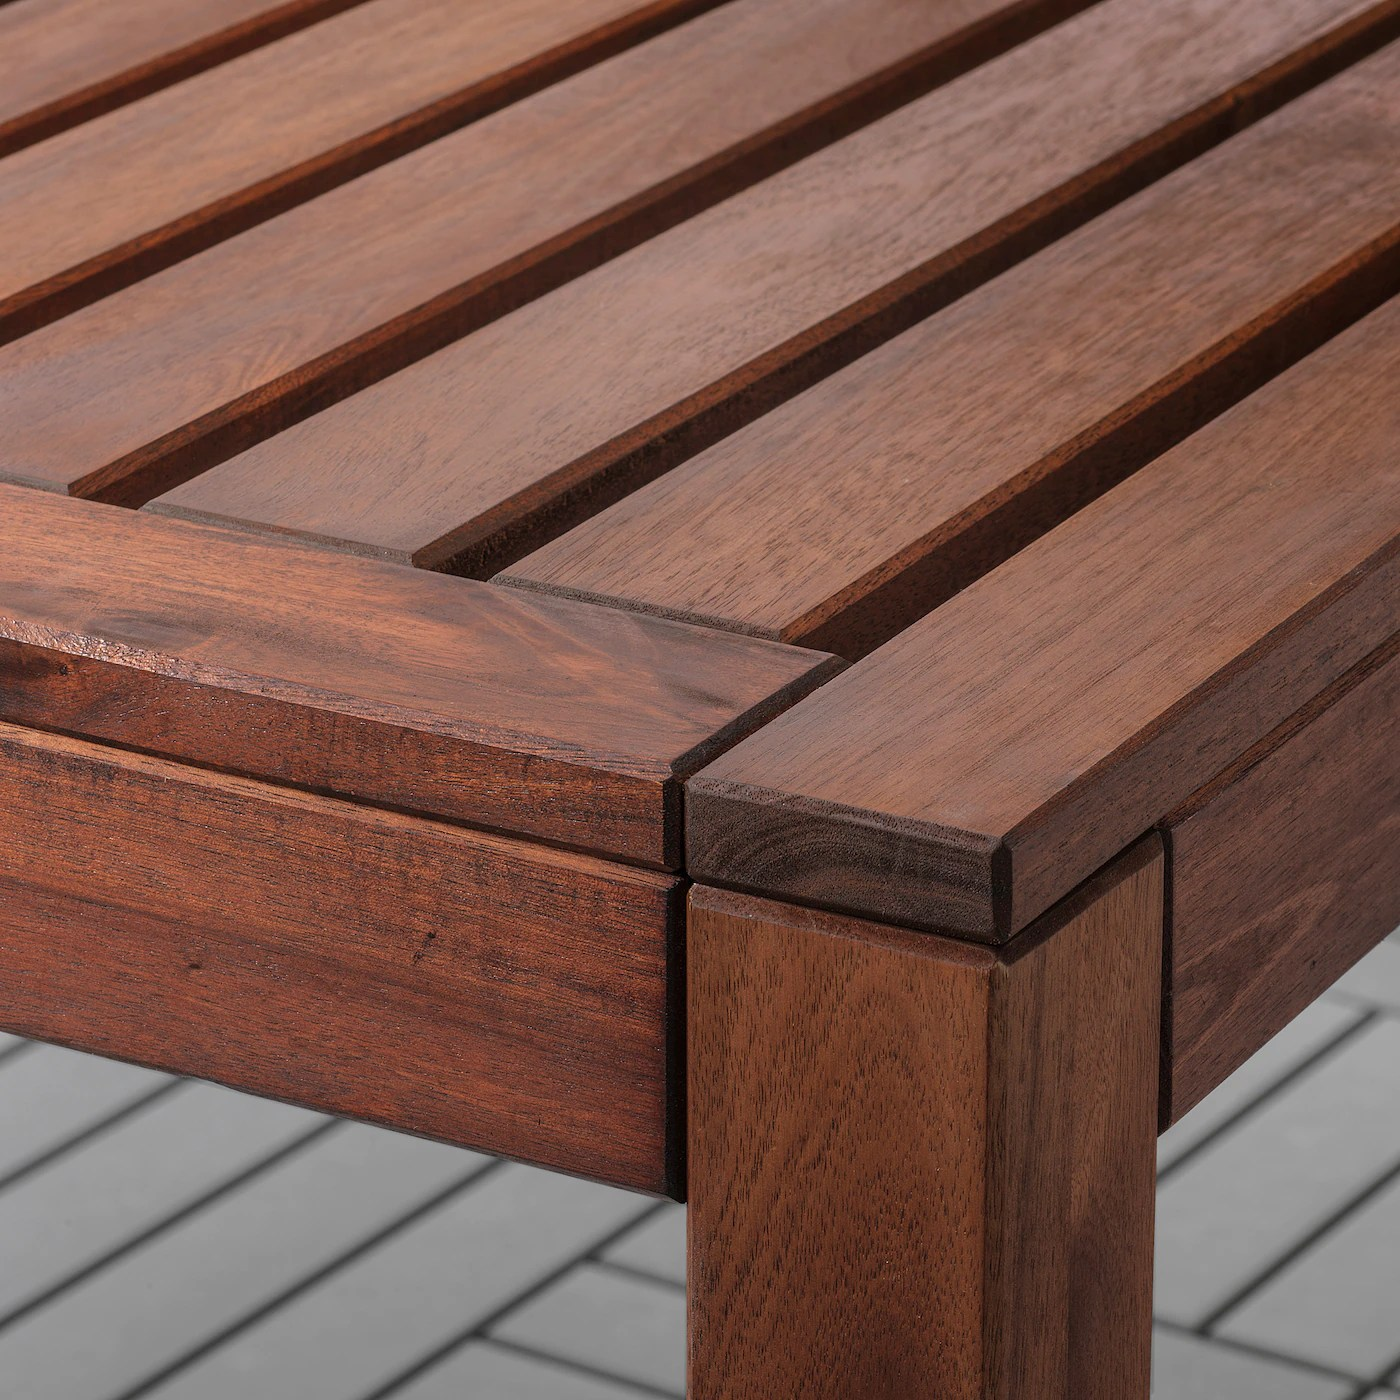 Applaro Table 6 Chairs Armr Bench Outdoor Black Ikea